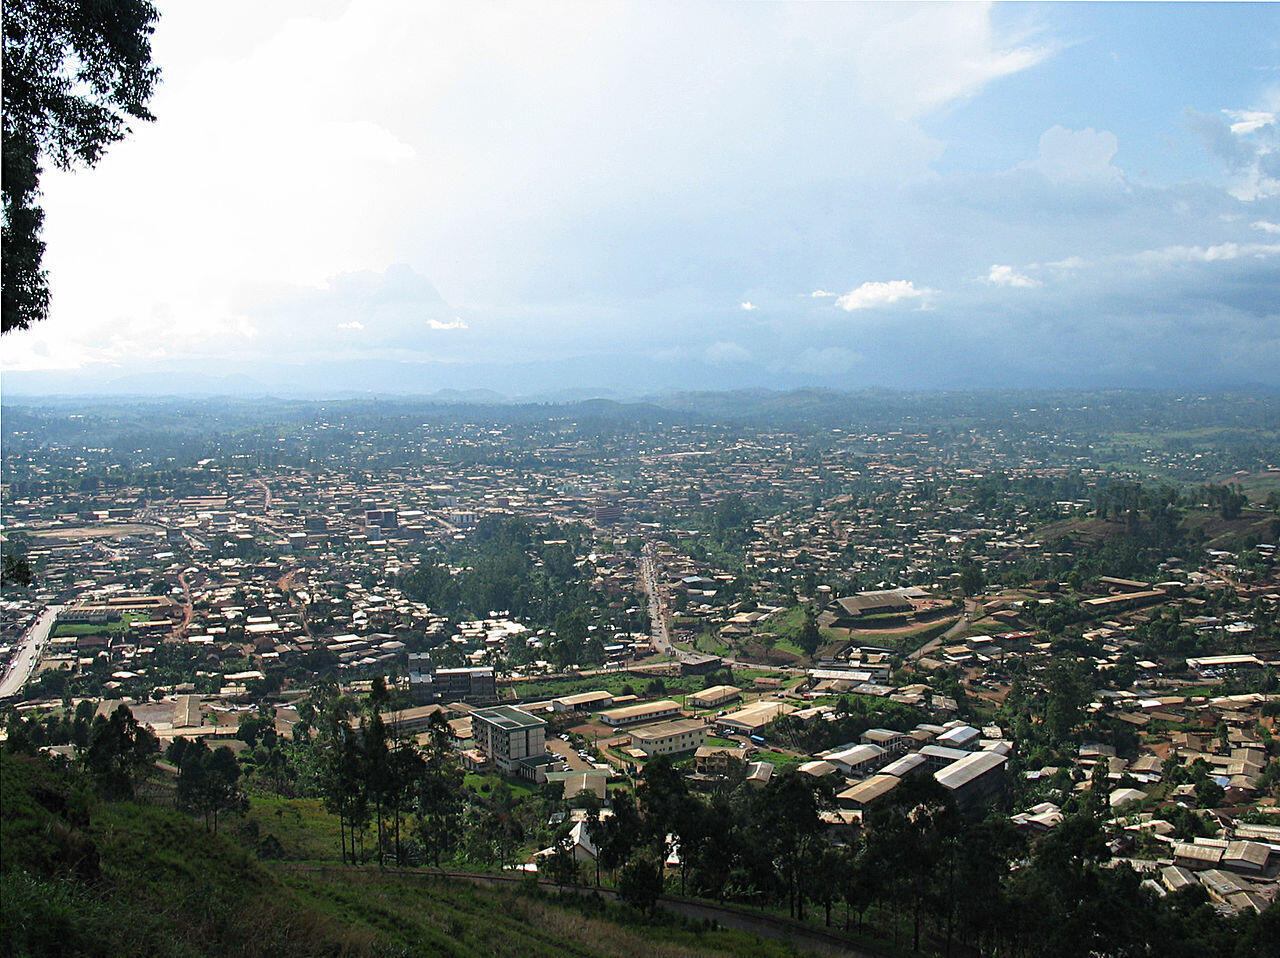 Bamenda in northwestern Cameroon